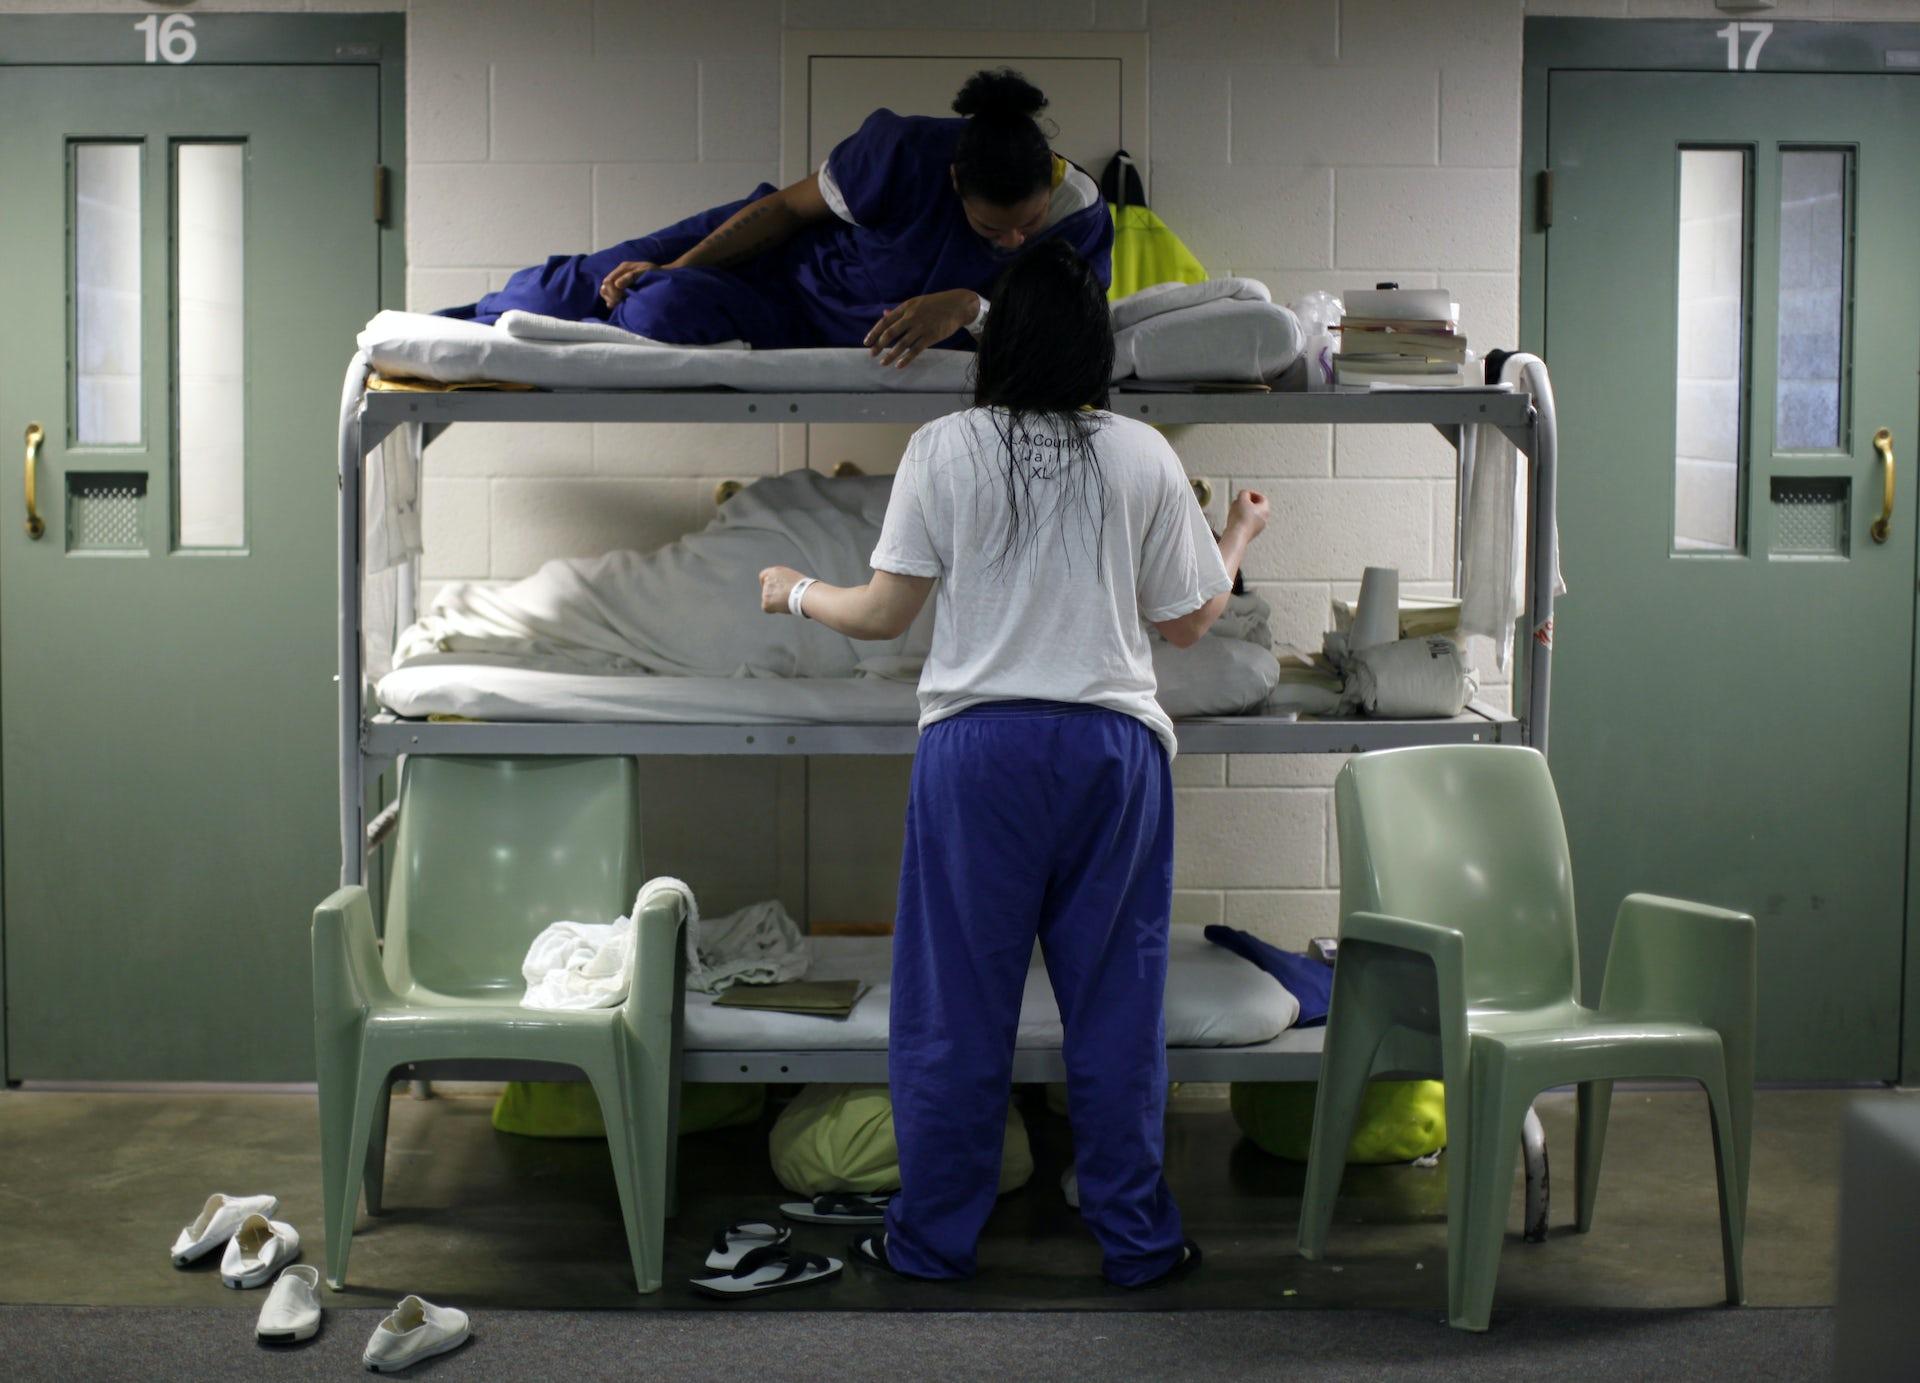 american essay overcrowding prison american essay overcrowding prison